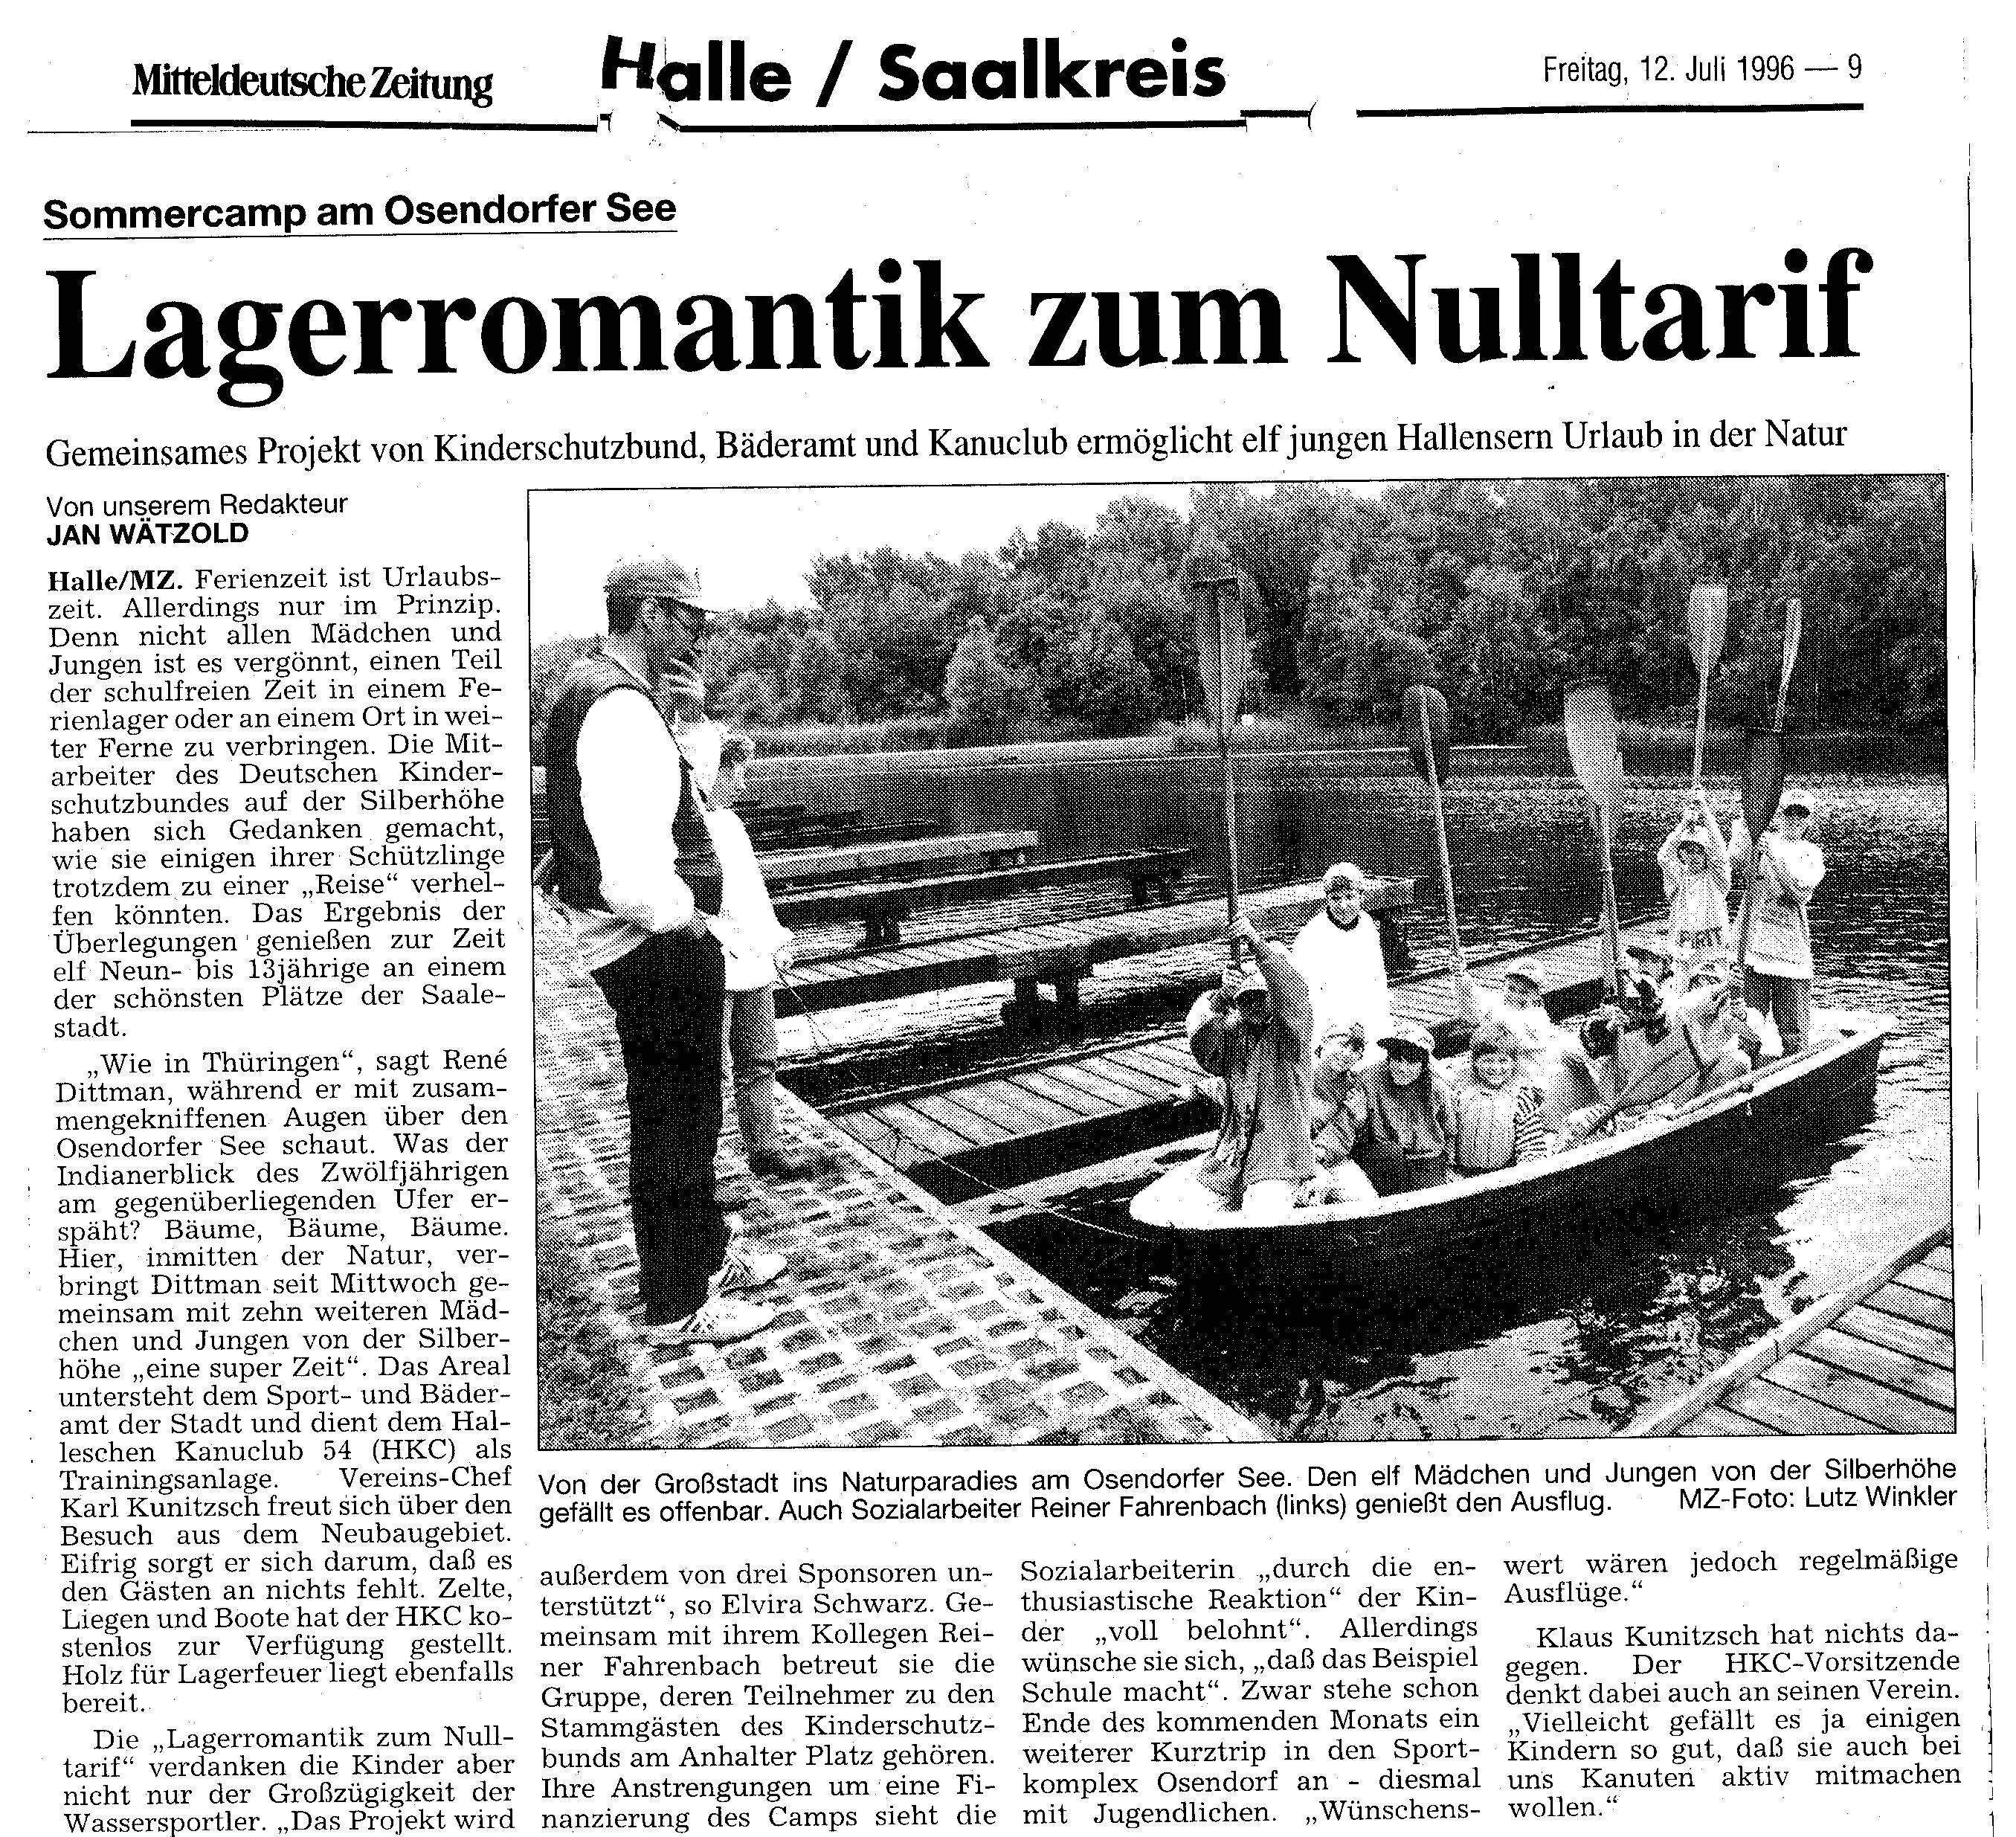 1996-07-12 MZ Lagerromantik zum Nulltarif